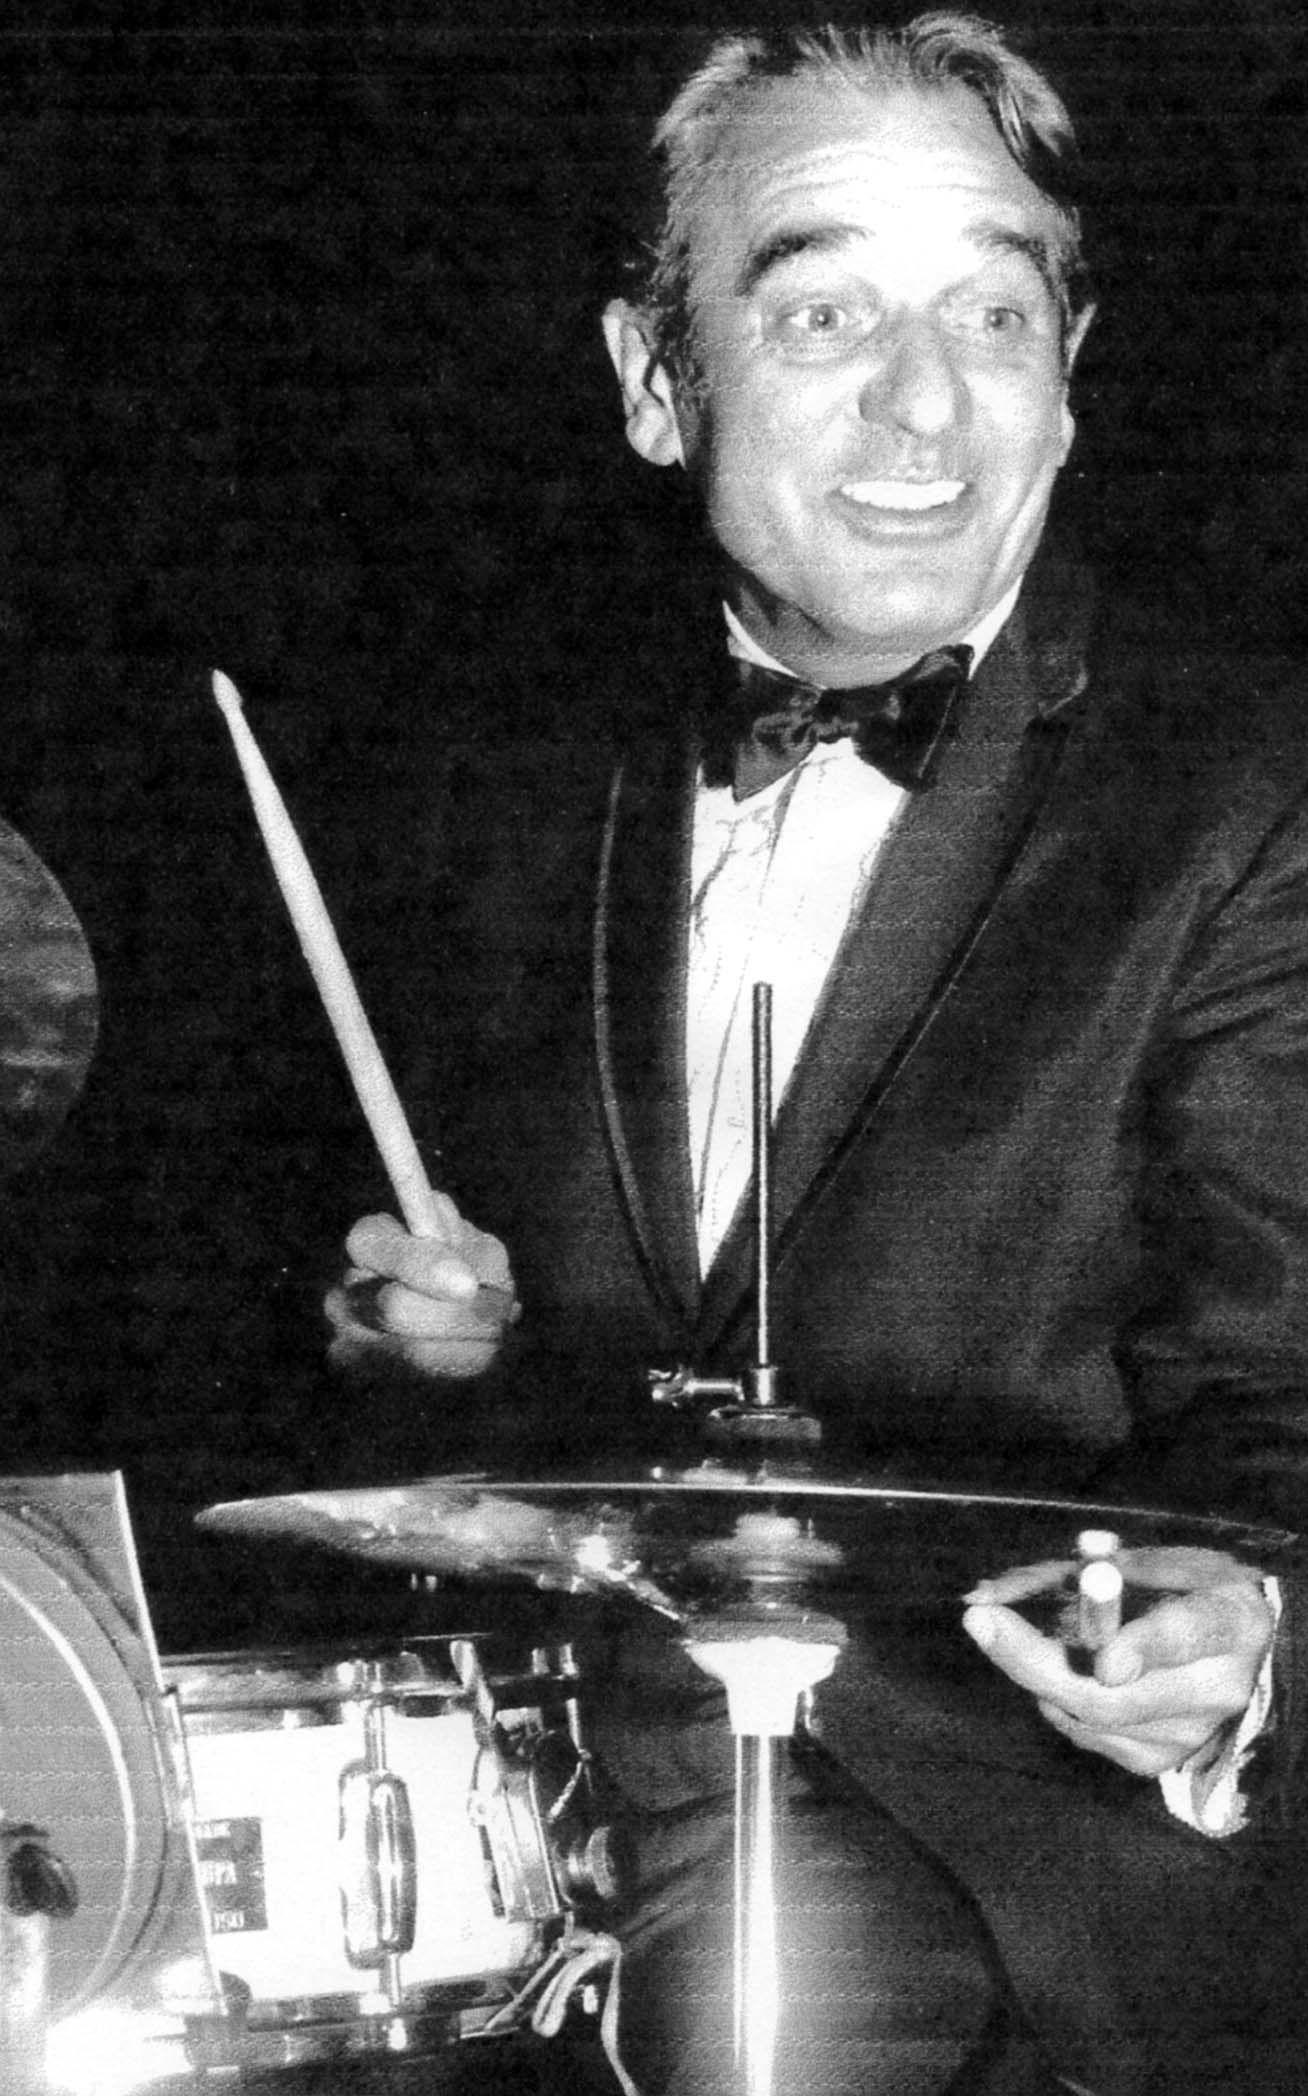 Pin by David Rodriguez on Drum stuff | Gretsch drums, Snare drum